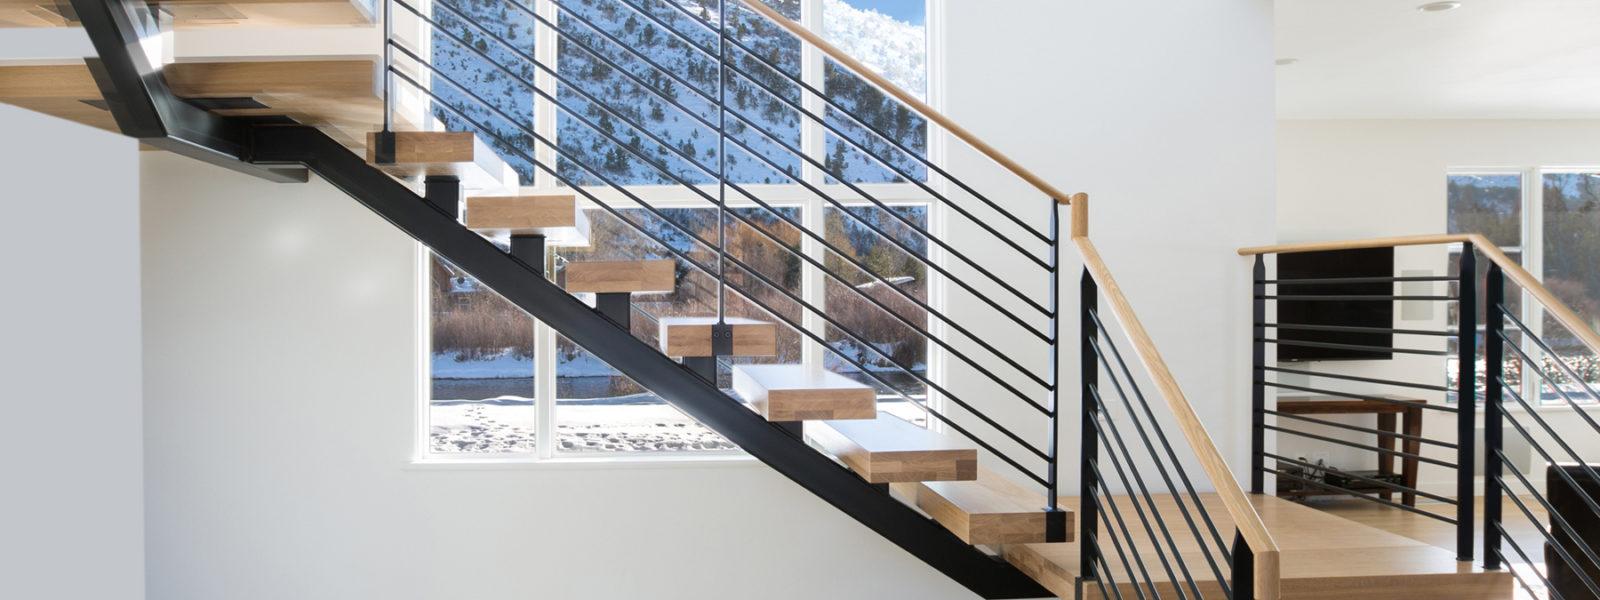 Modern Mono Beam Stairway in Aspen, Colorado by Arcways Custom Stairs